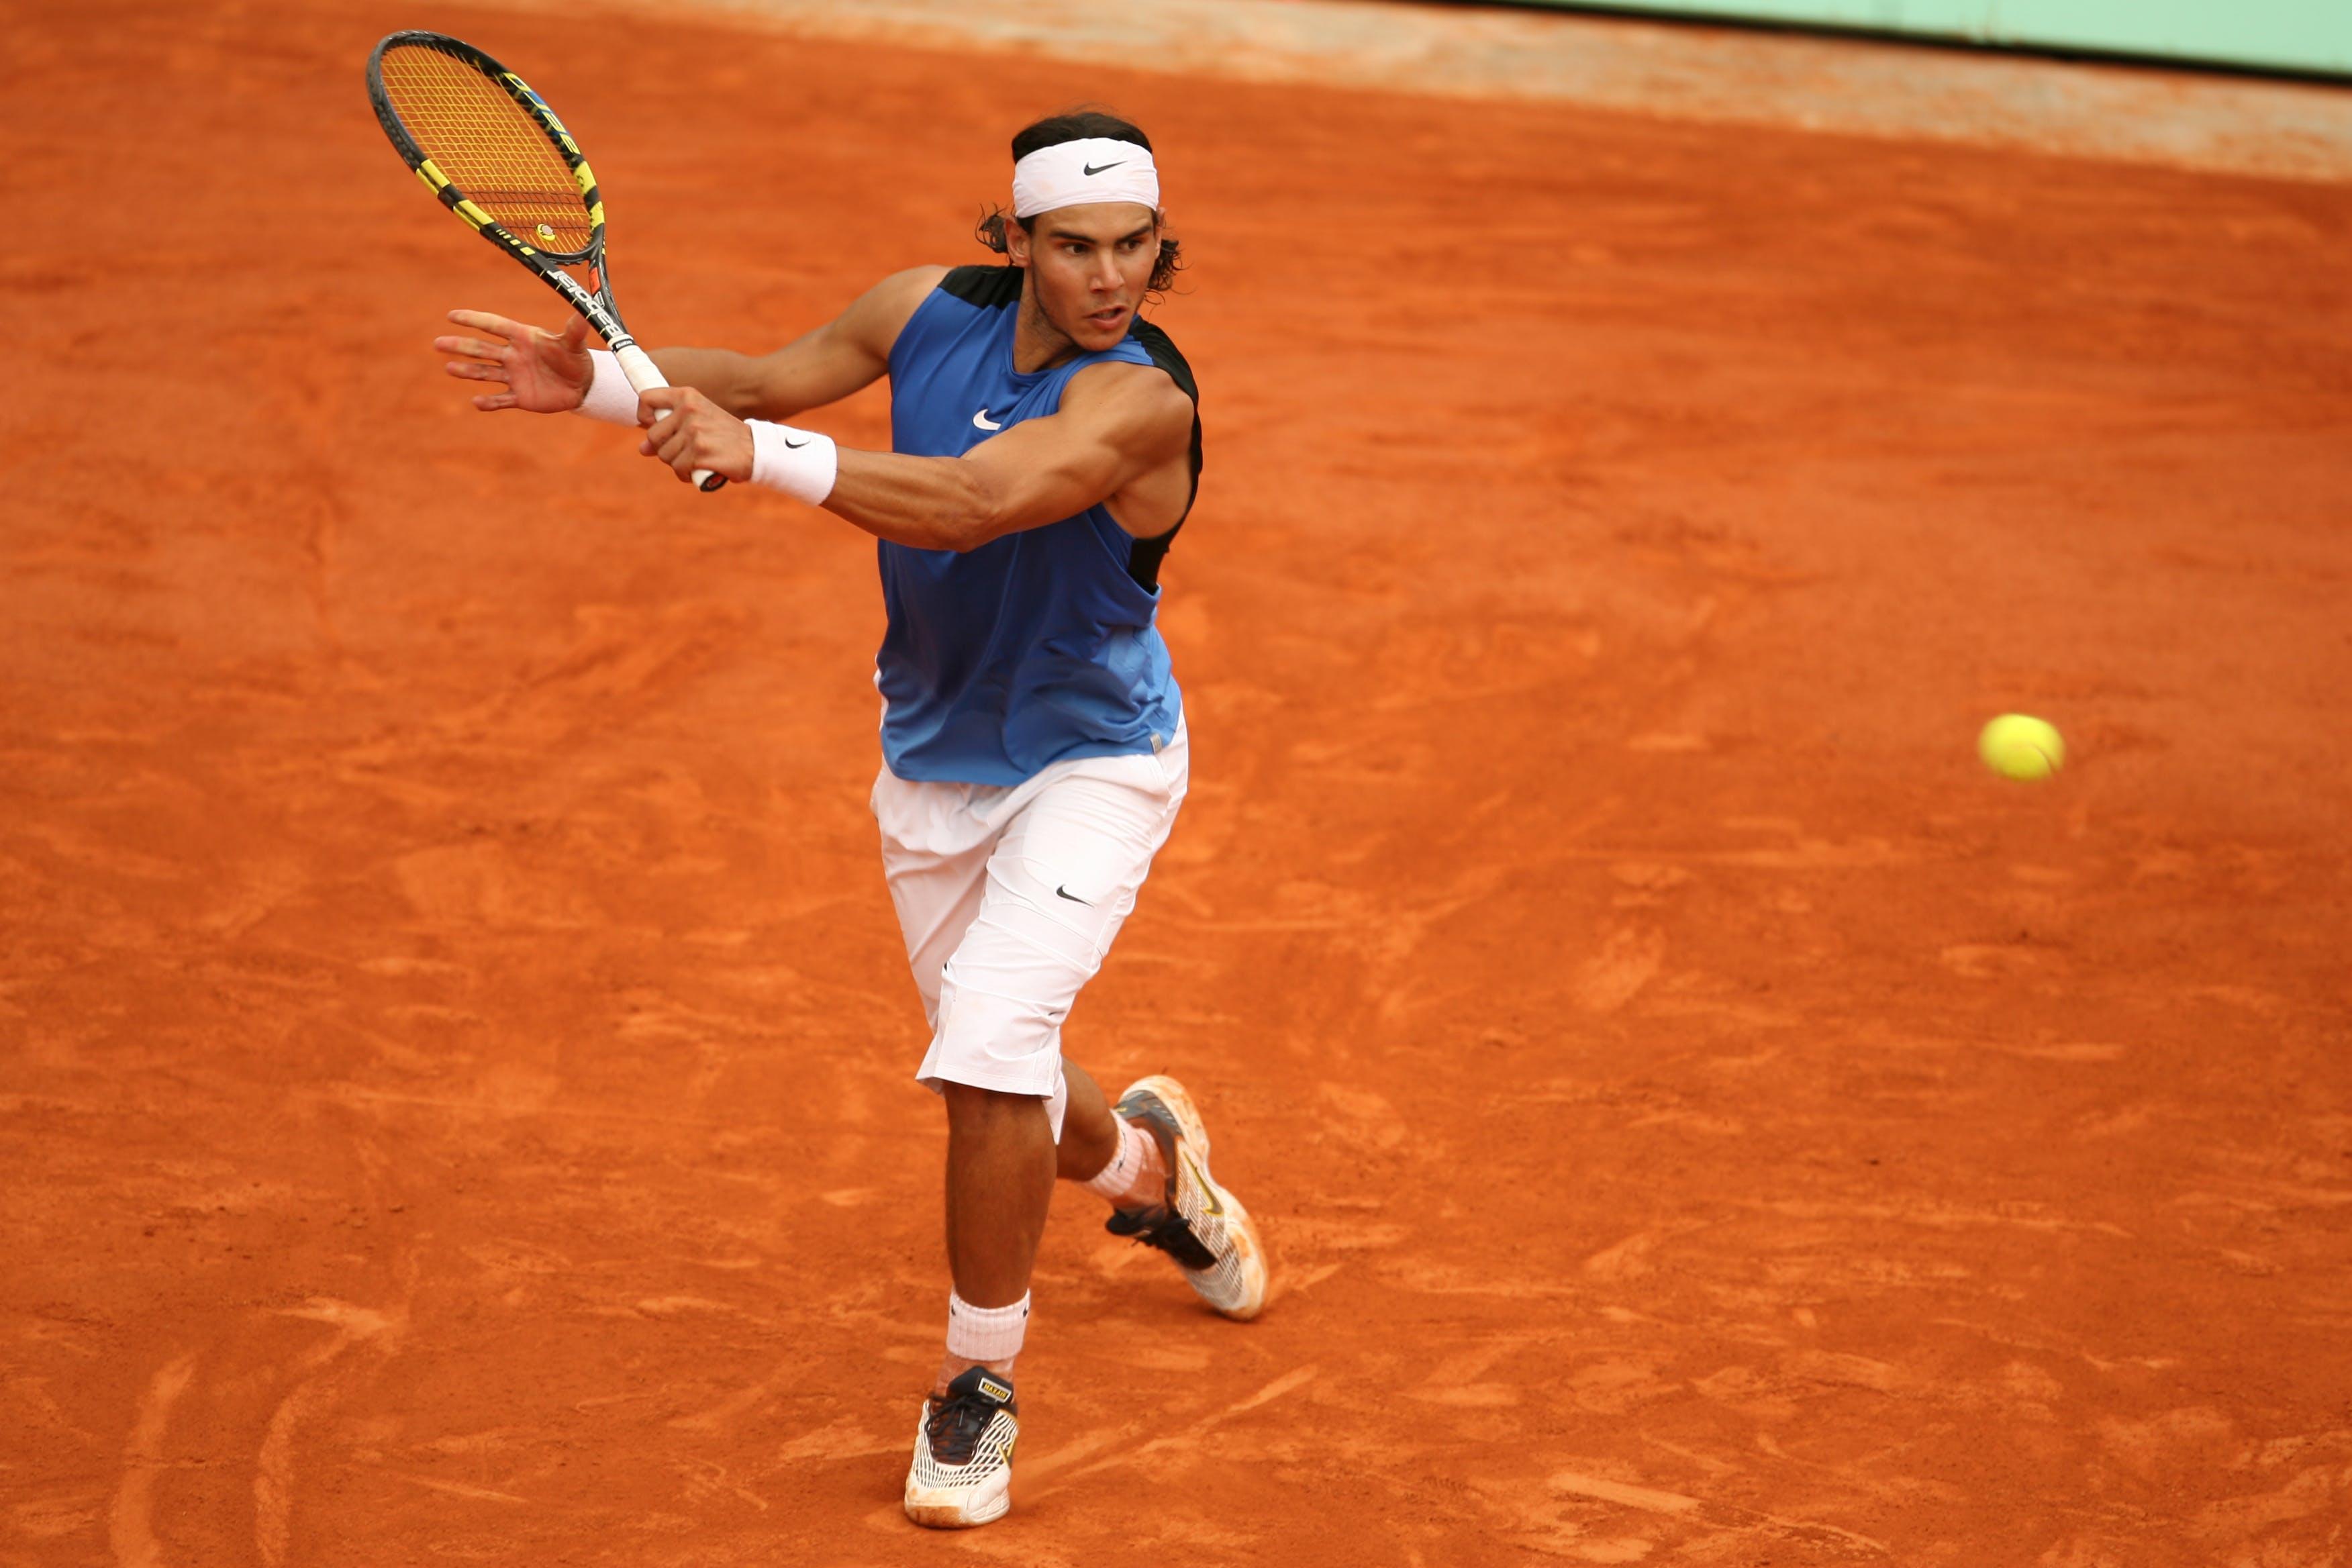 Nadal during the third round at Roland-Garros 2006